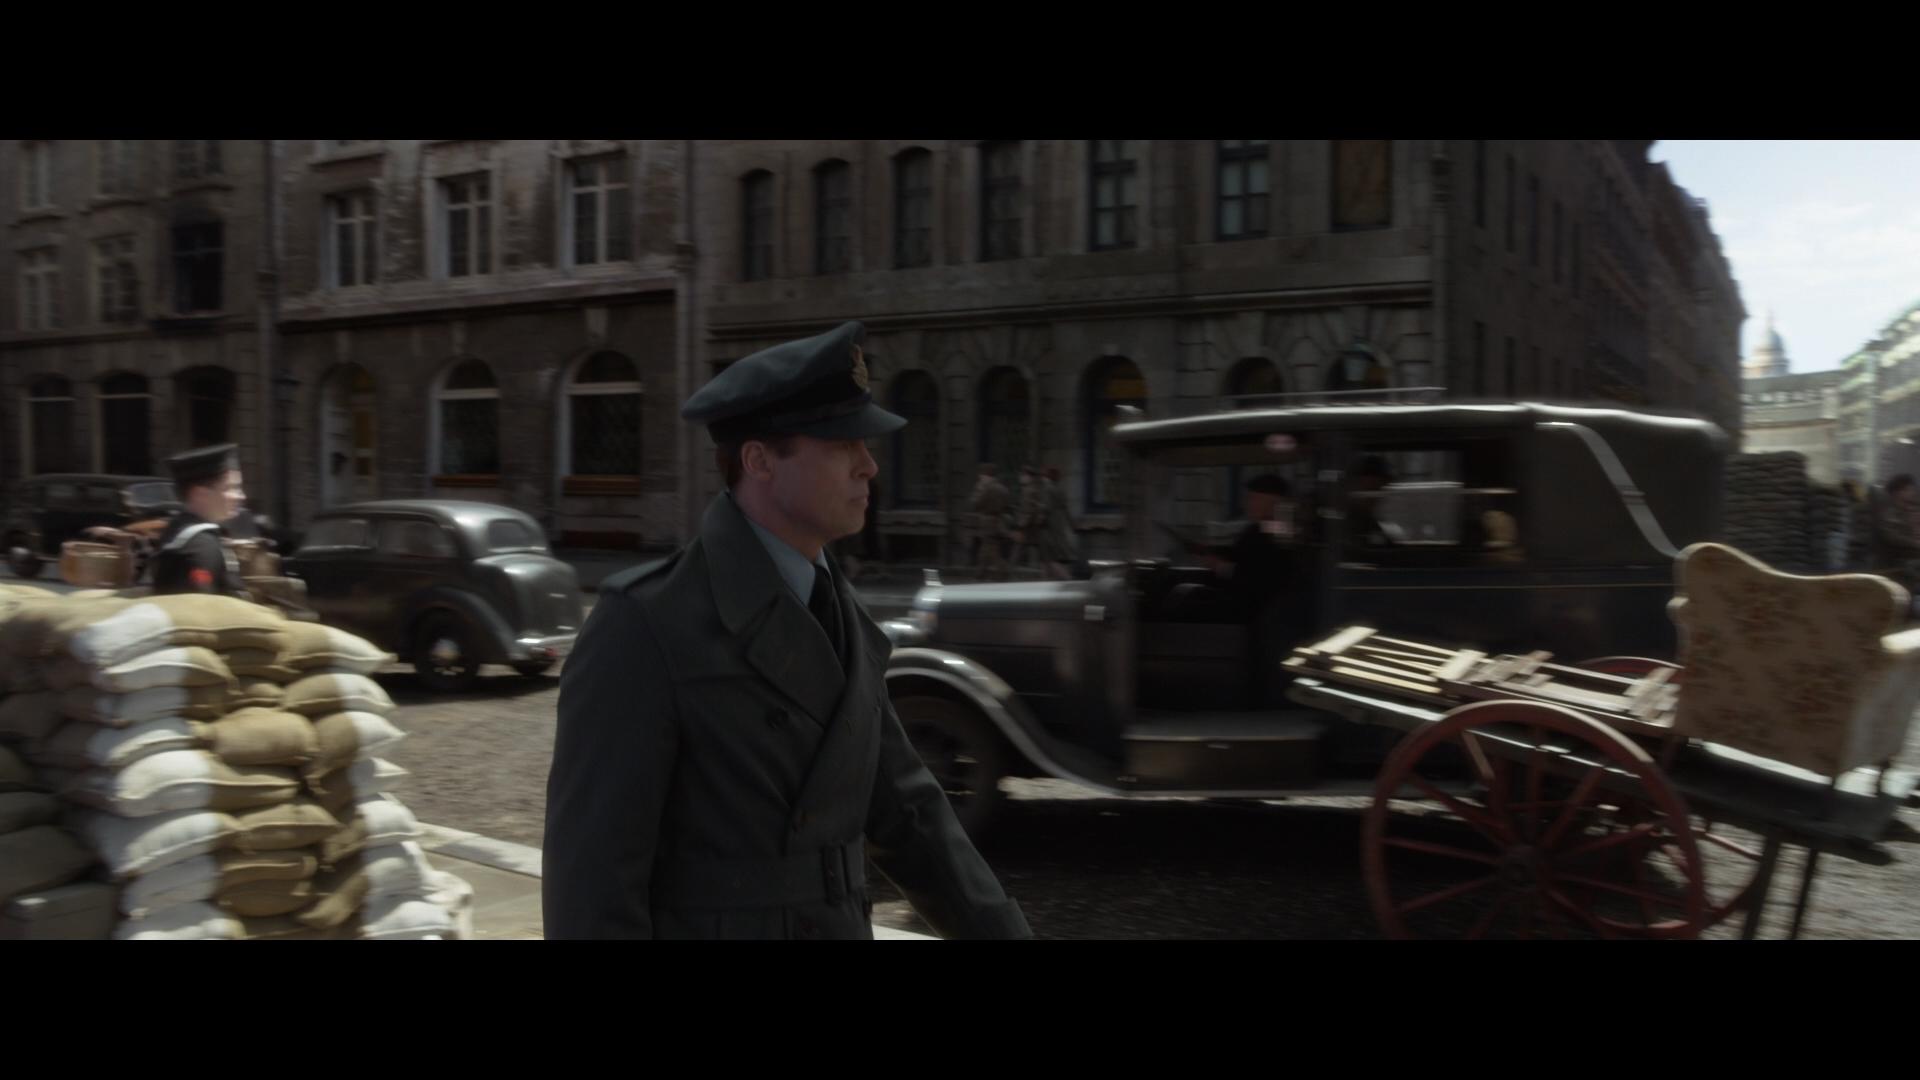 ALLIED (2016) - Max's (Brad Pitt) Military Overcoat - Image 10 of 17